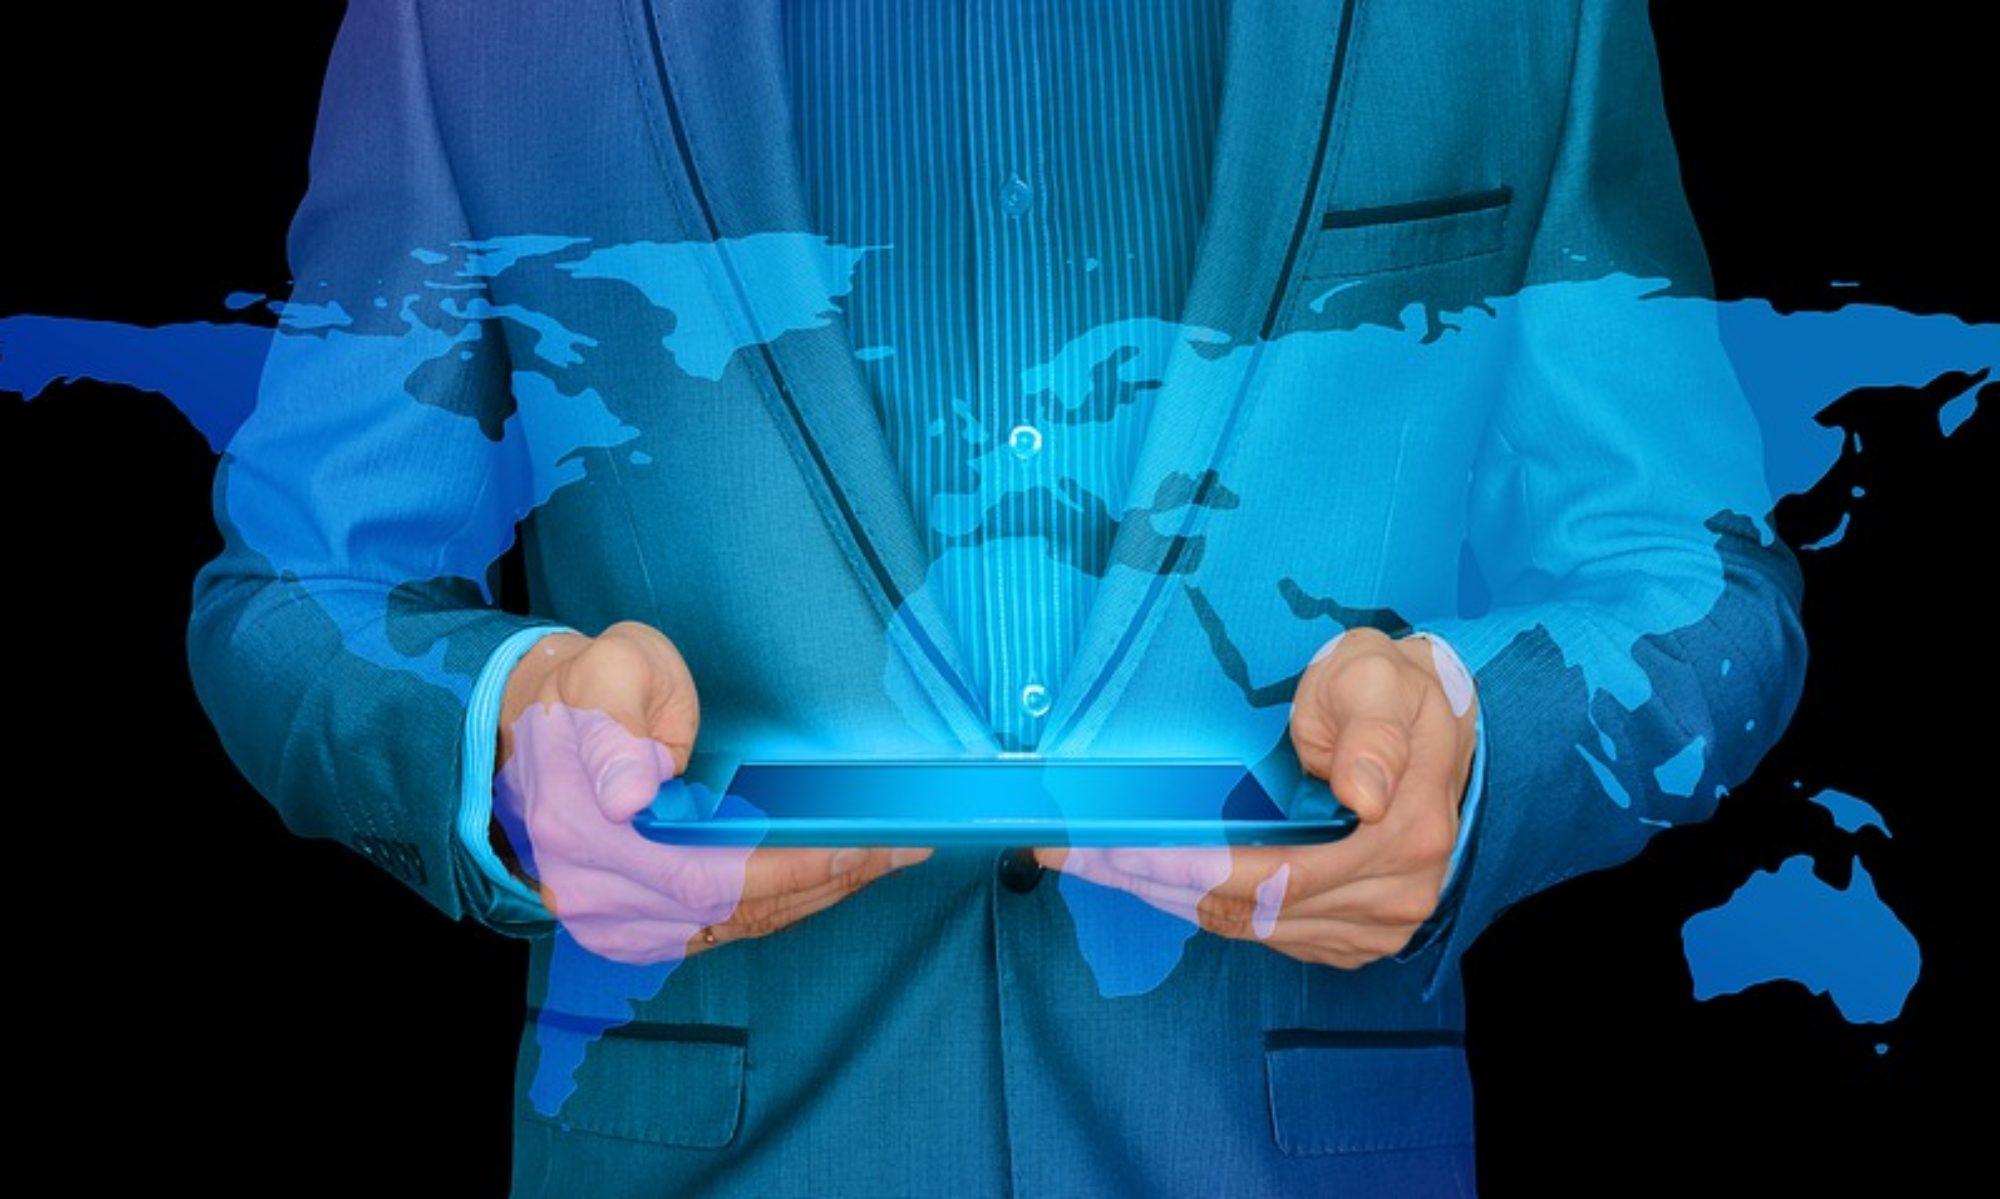 Digi BIM - Digital Building Information Modeling - Digitaalne ehitusinformatsiooni modelleerimine